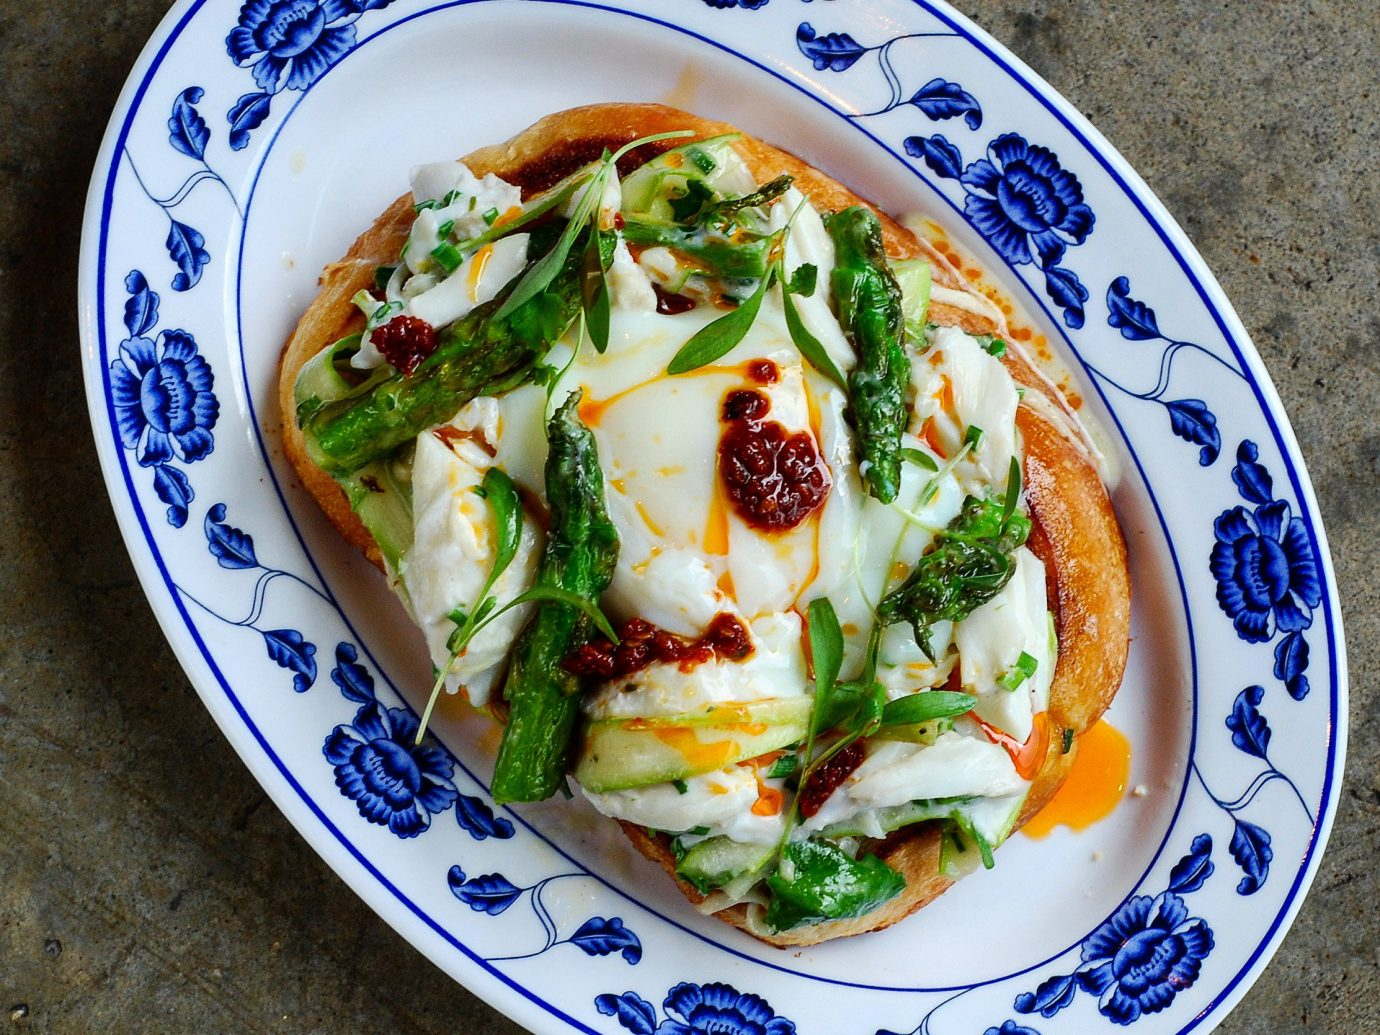 Boutique Hotels Hotels Trip Ideas plate floor food dish cuisine vegetarian food meal breakfast recipe asian food vegetable side dish